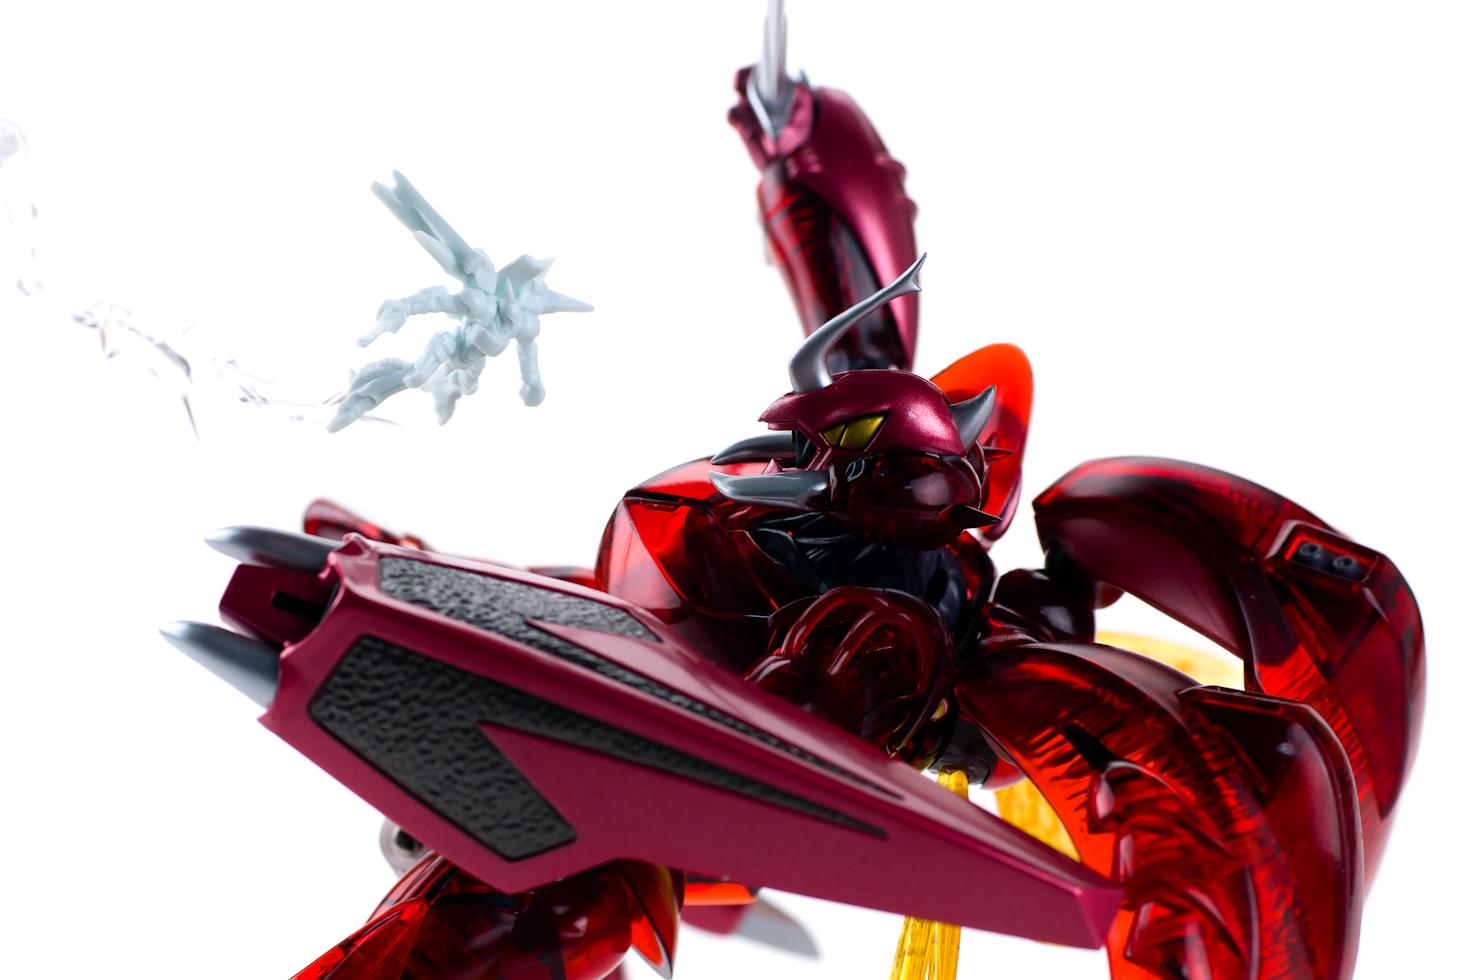 ROBOT魂〈SIDE AB〉レプラカーン (ハイパー化Ver.)